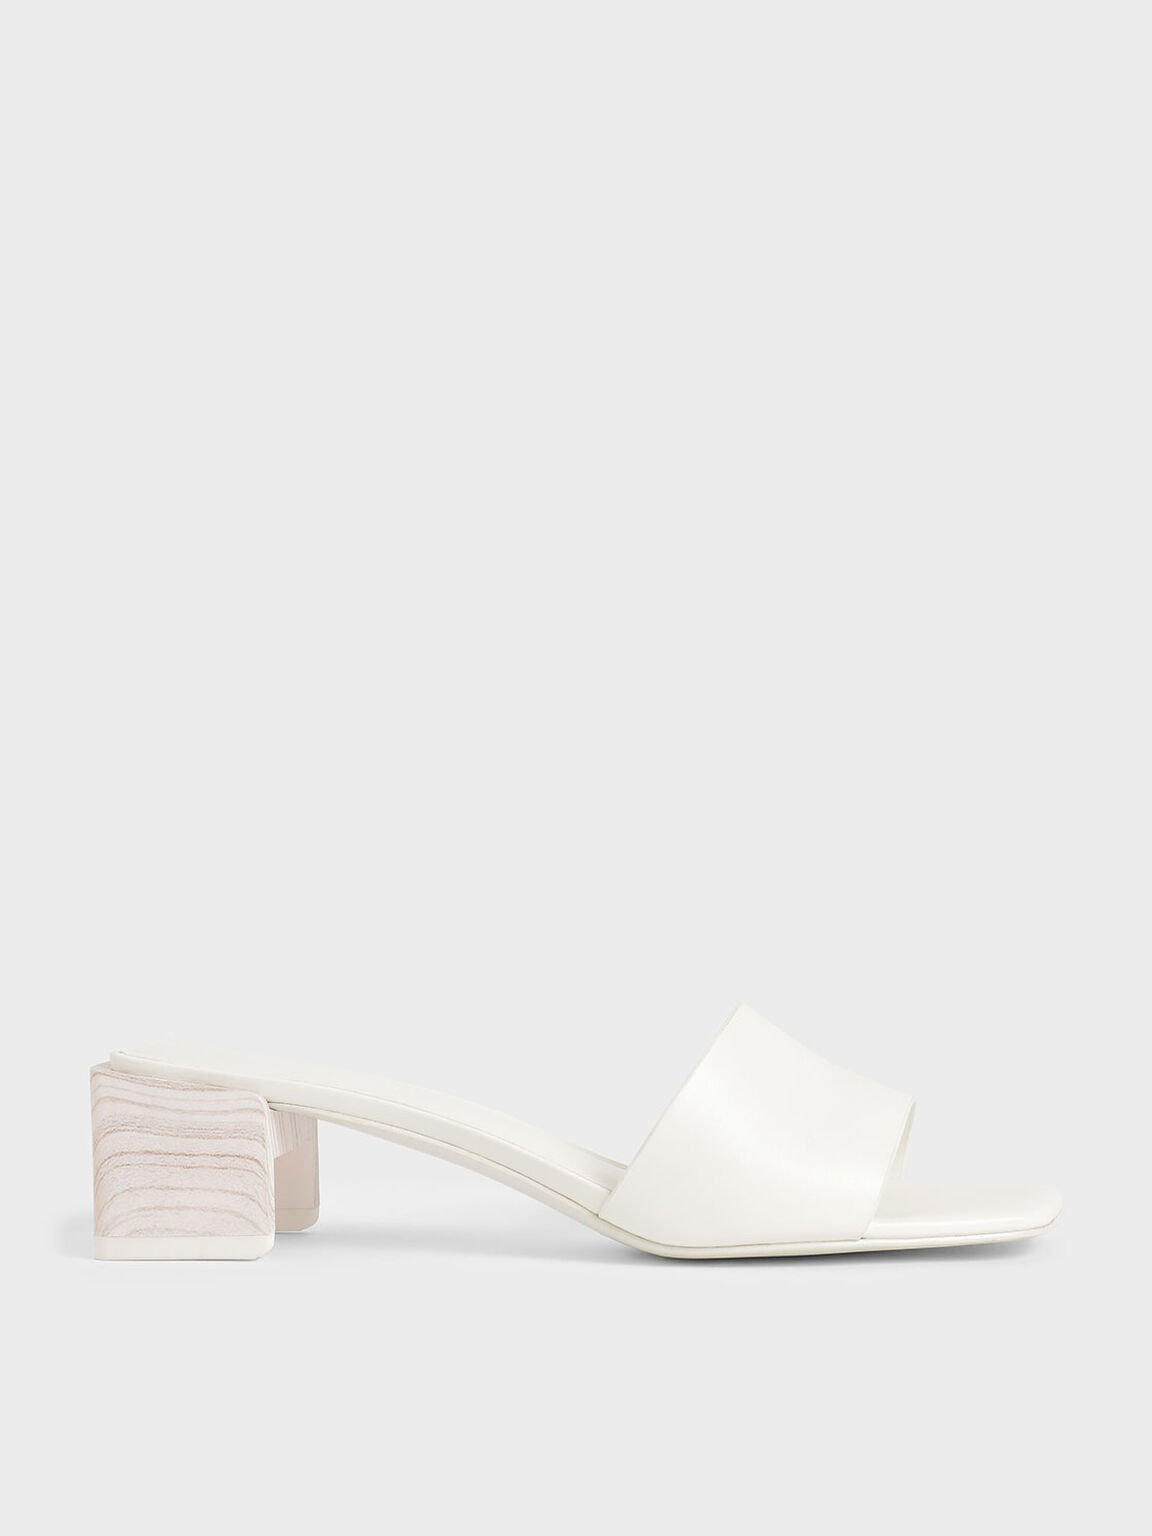 Sculptural Heel Mules, White, hi-res